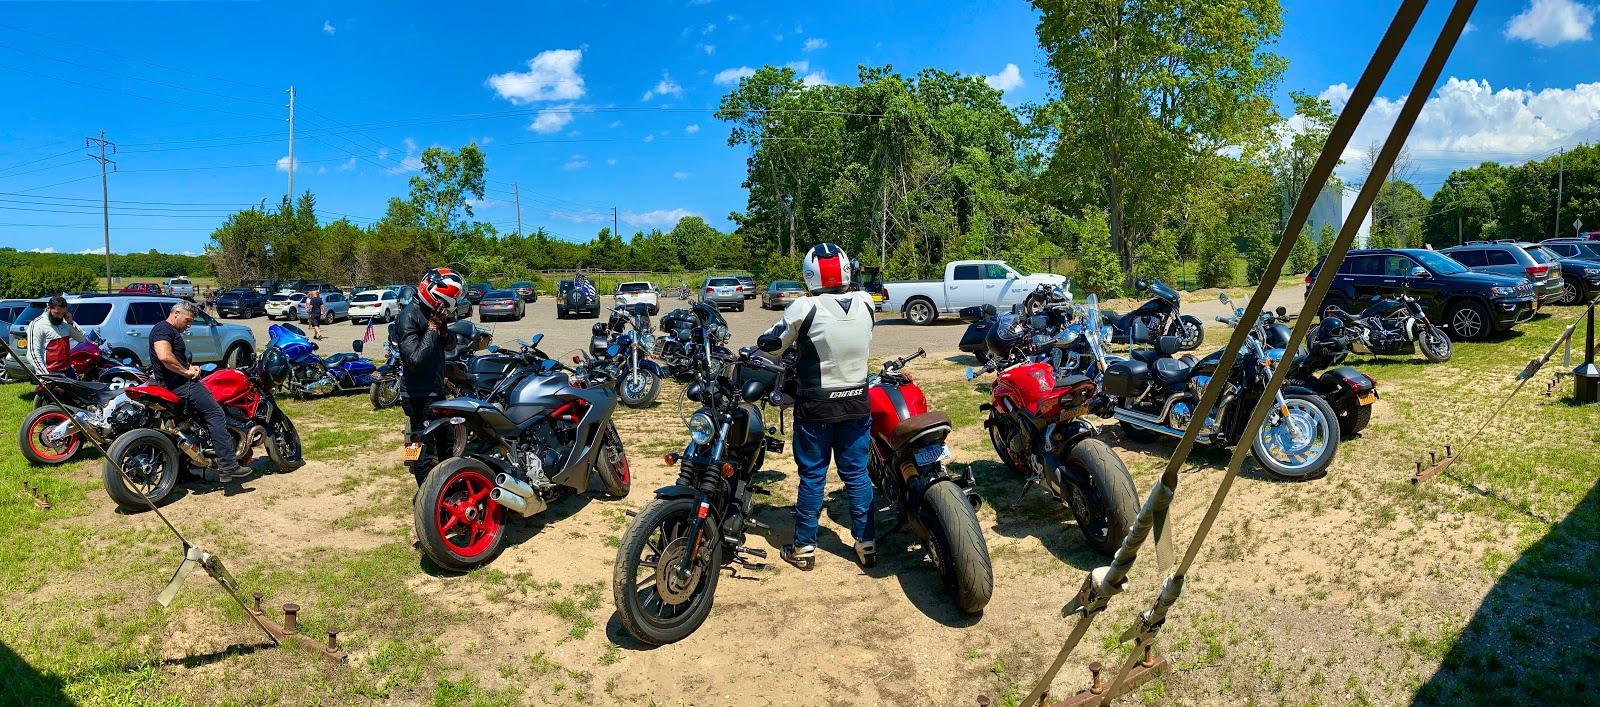 Ducs Summer North Shore July Ride